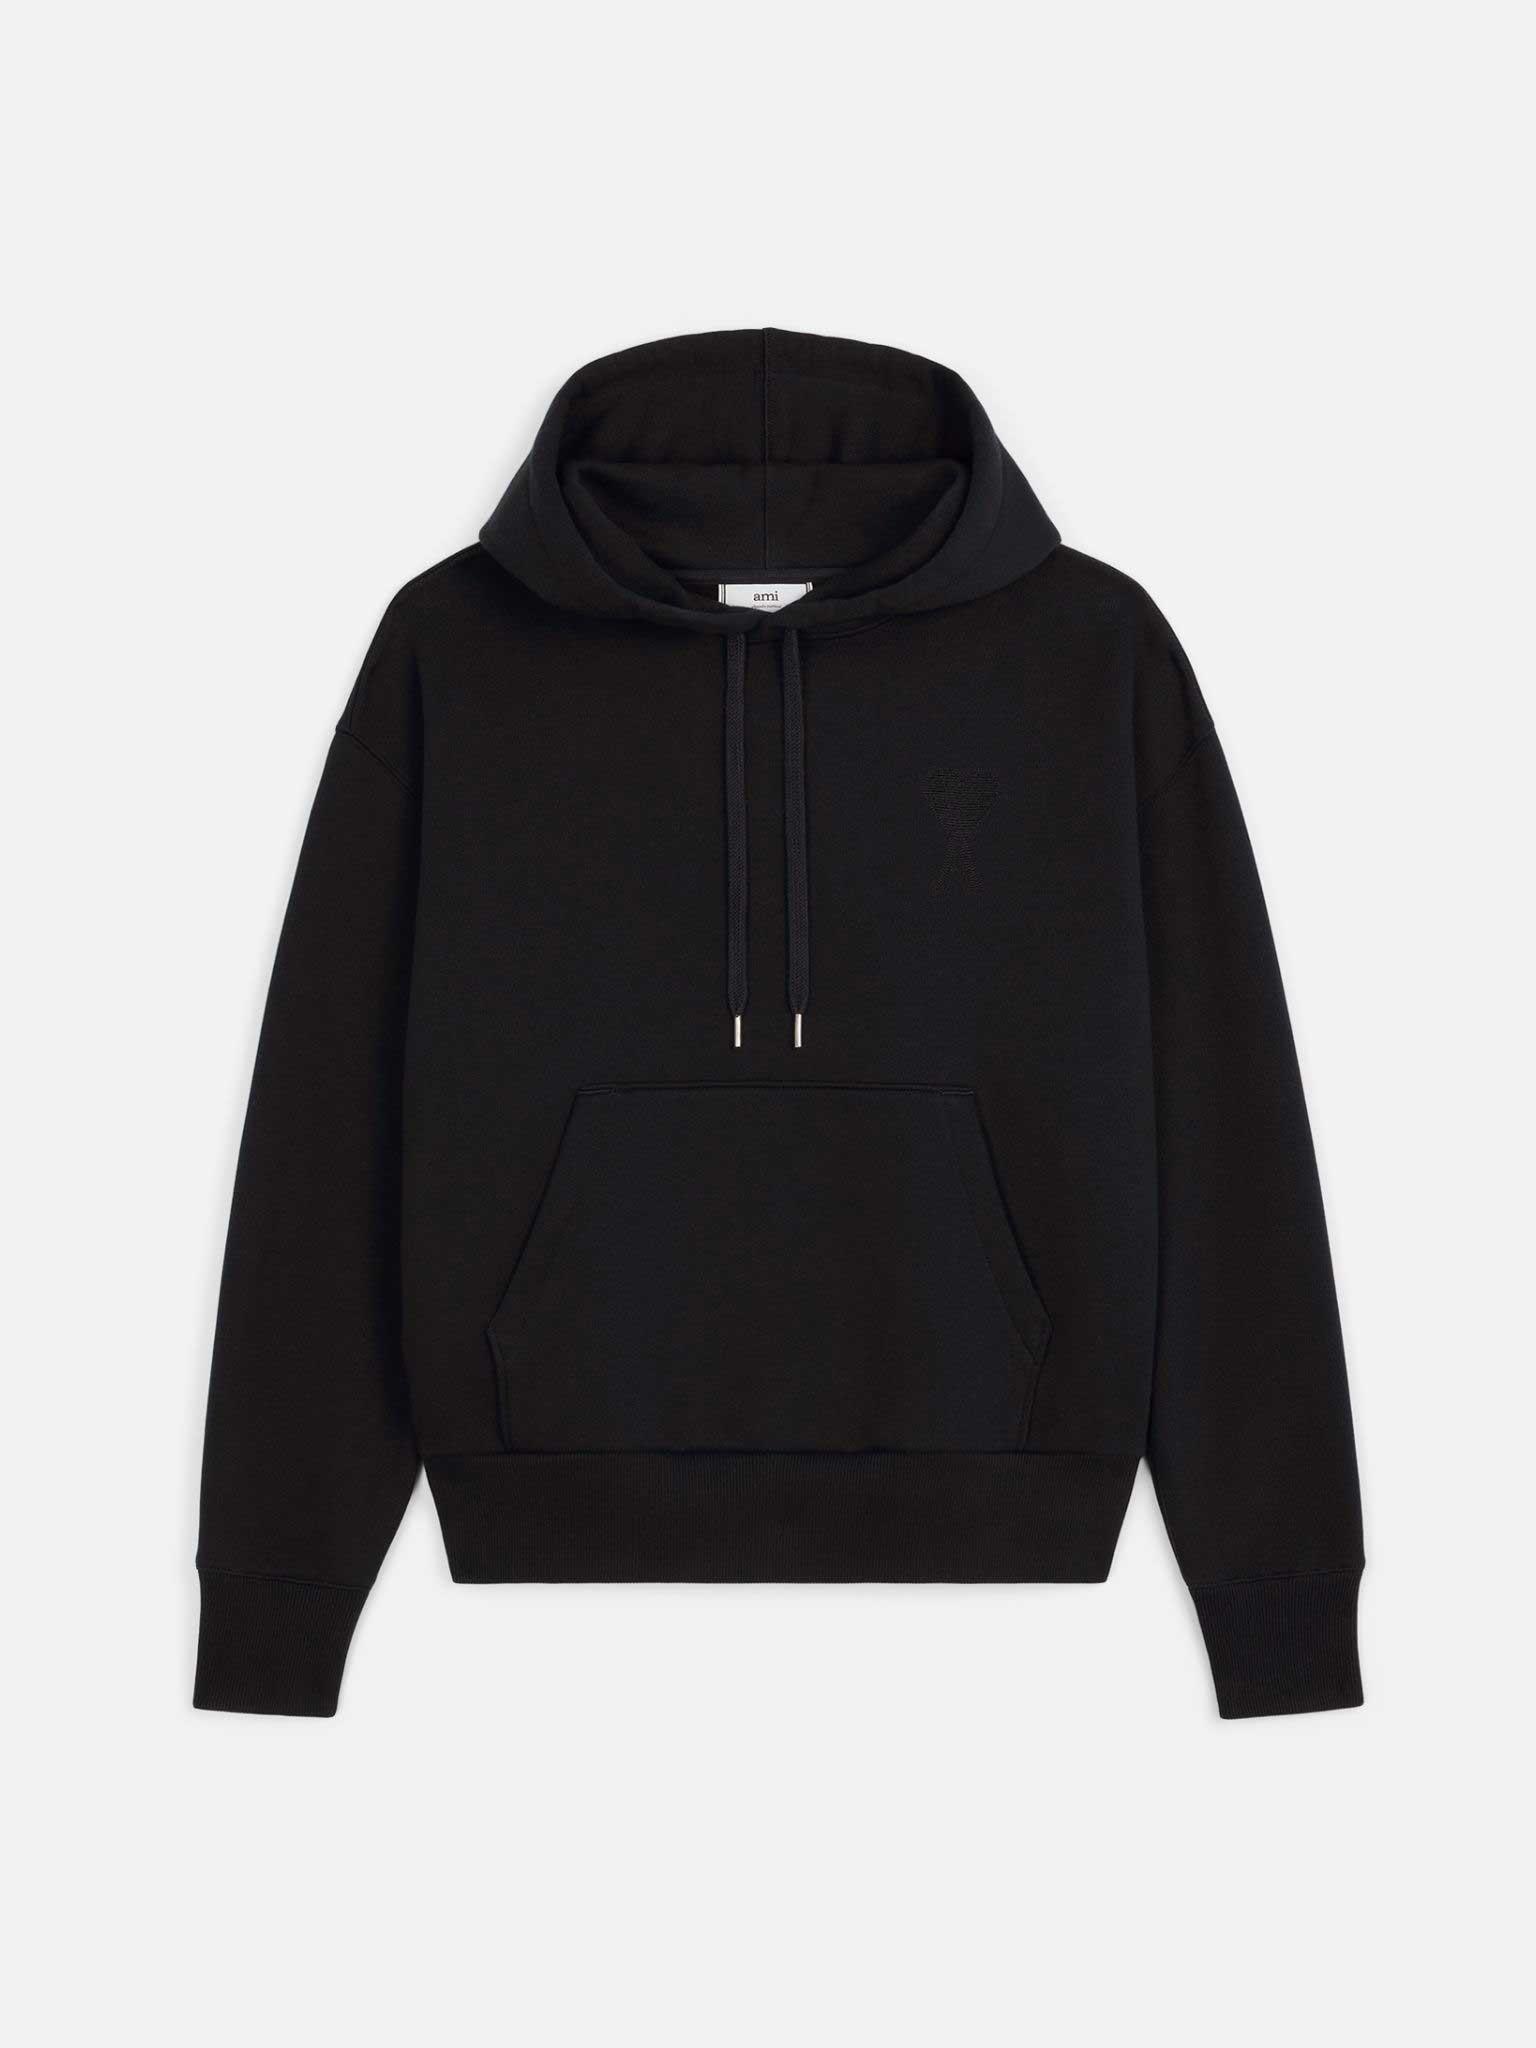 RUBY_AMI_ADC_hoodie_black02